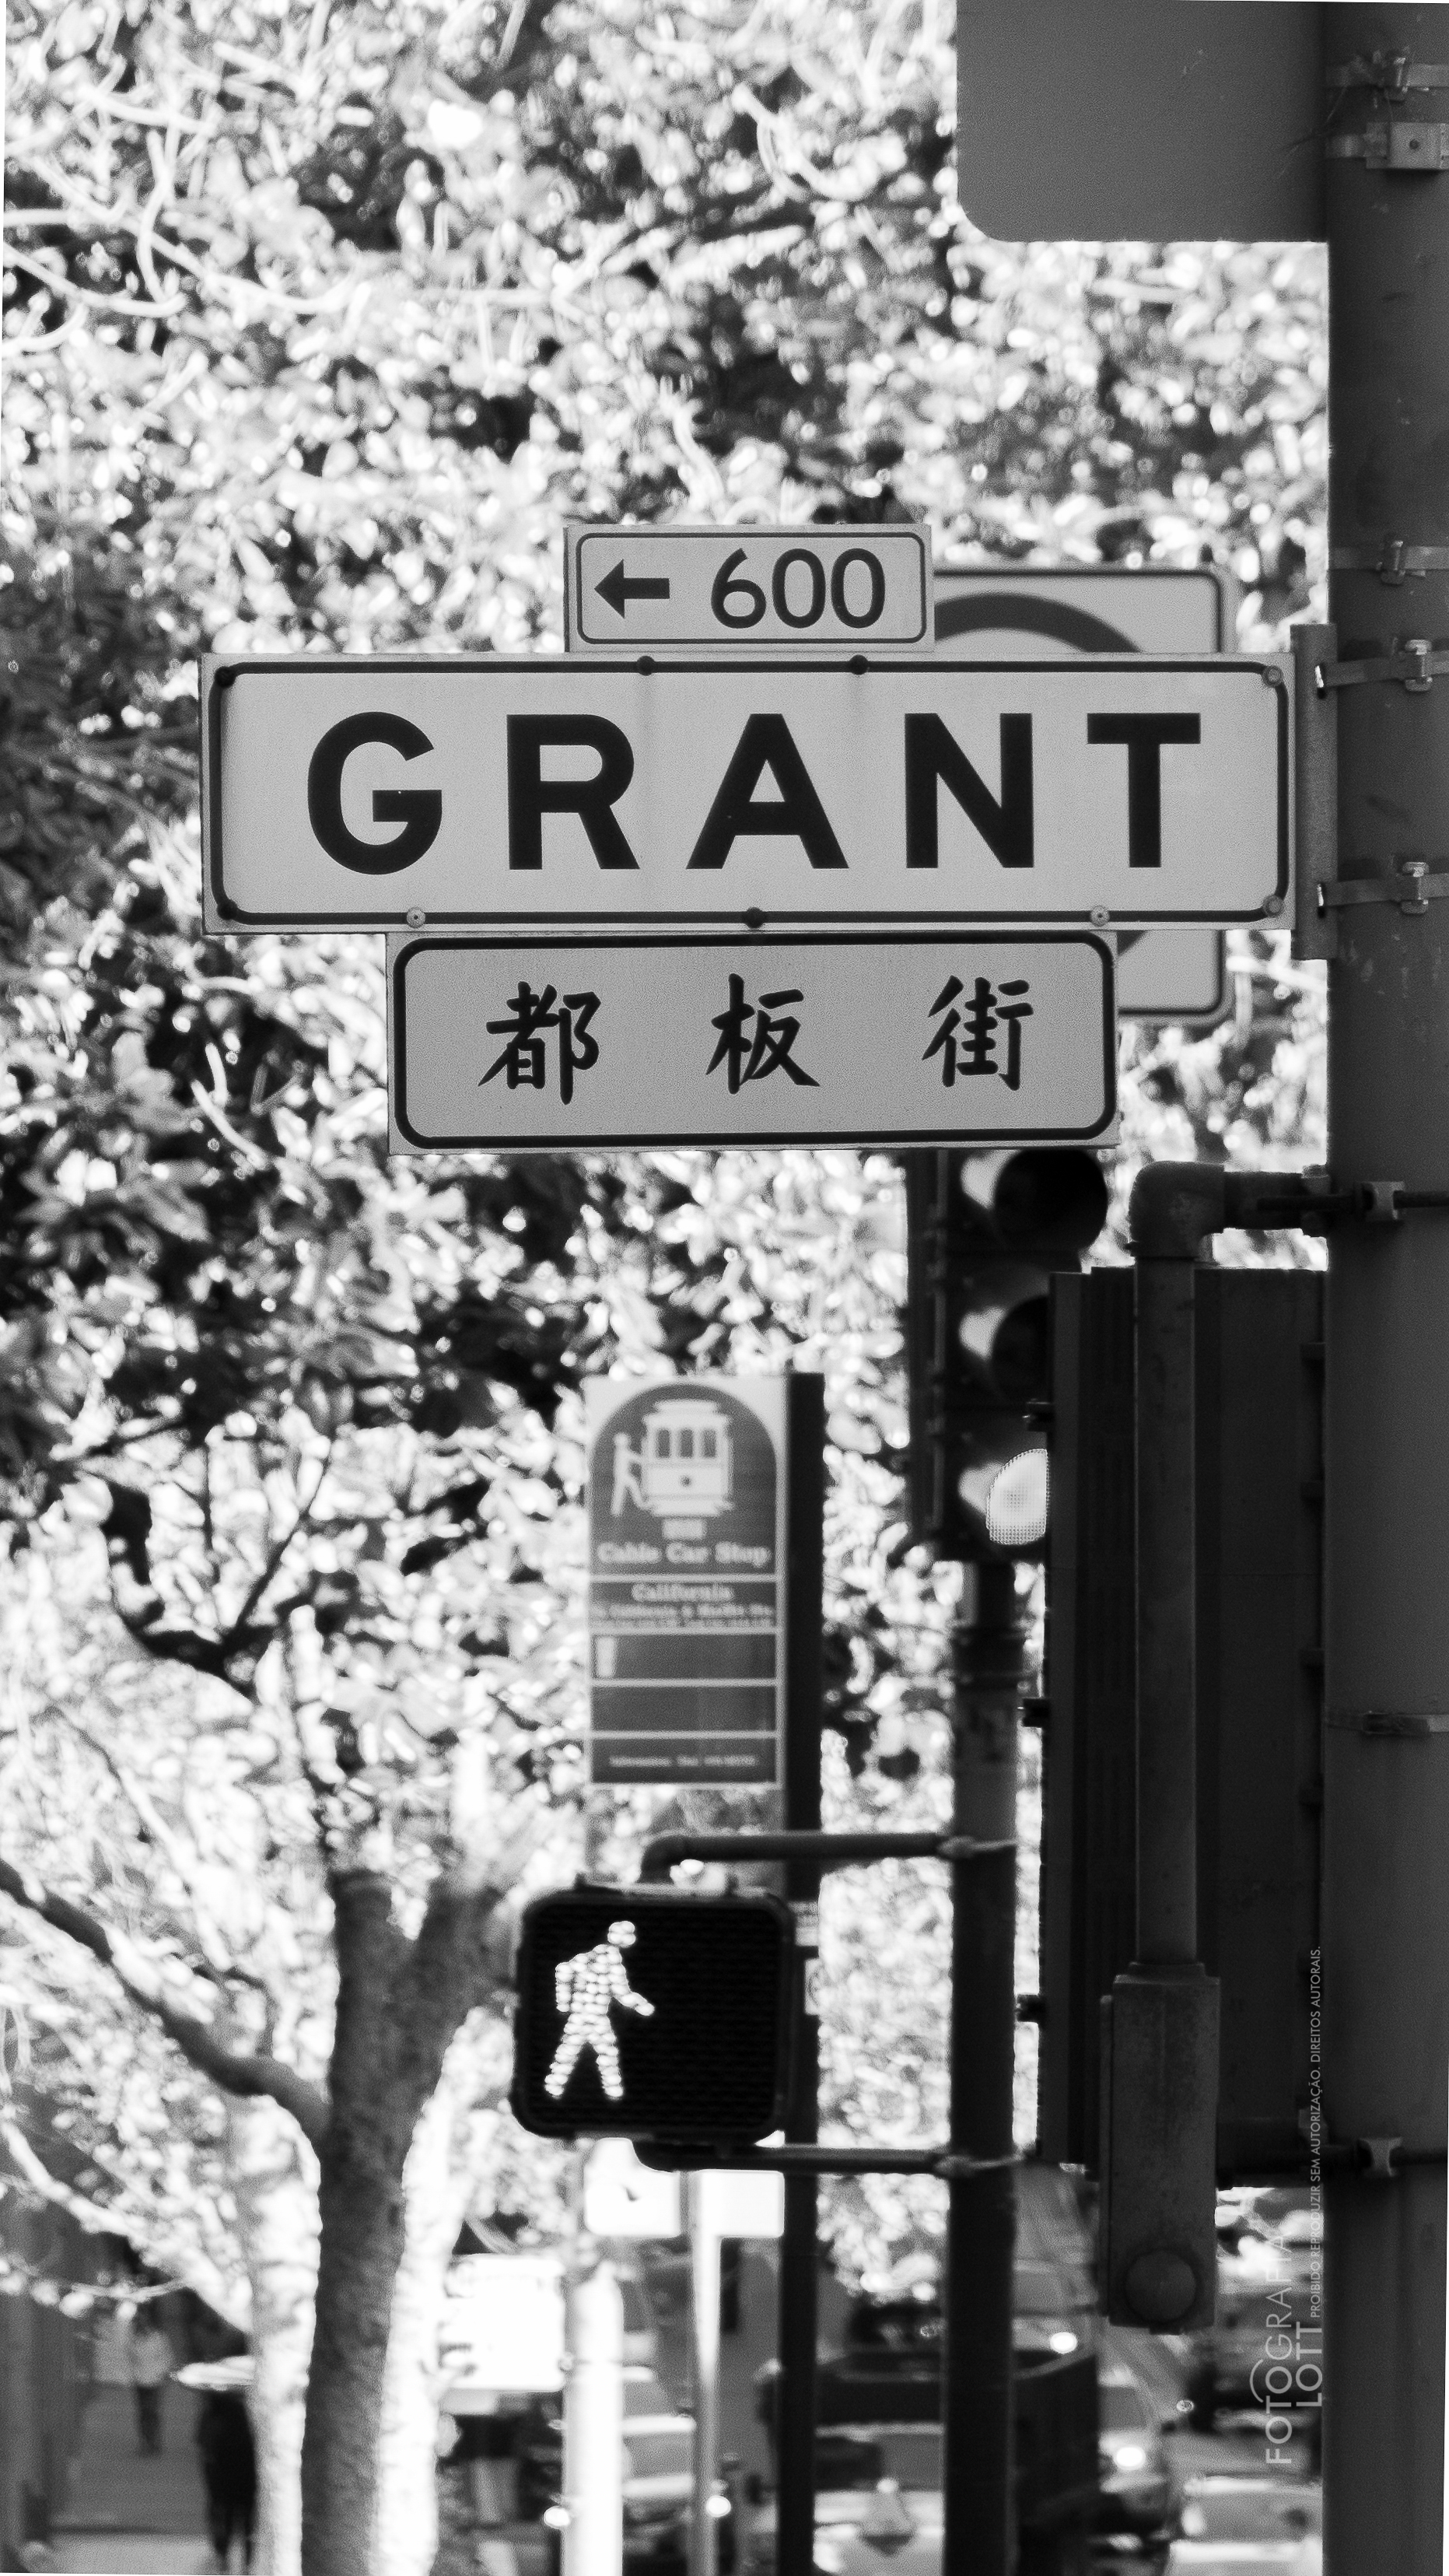 Street Grant